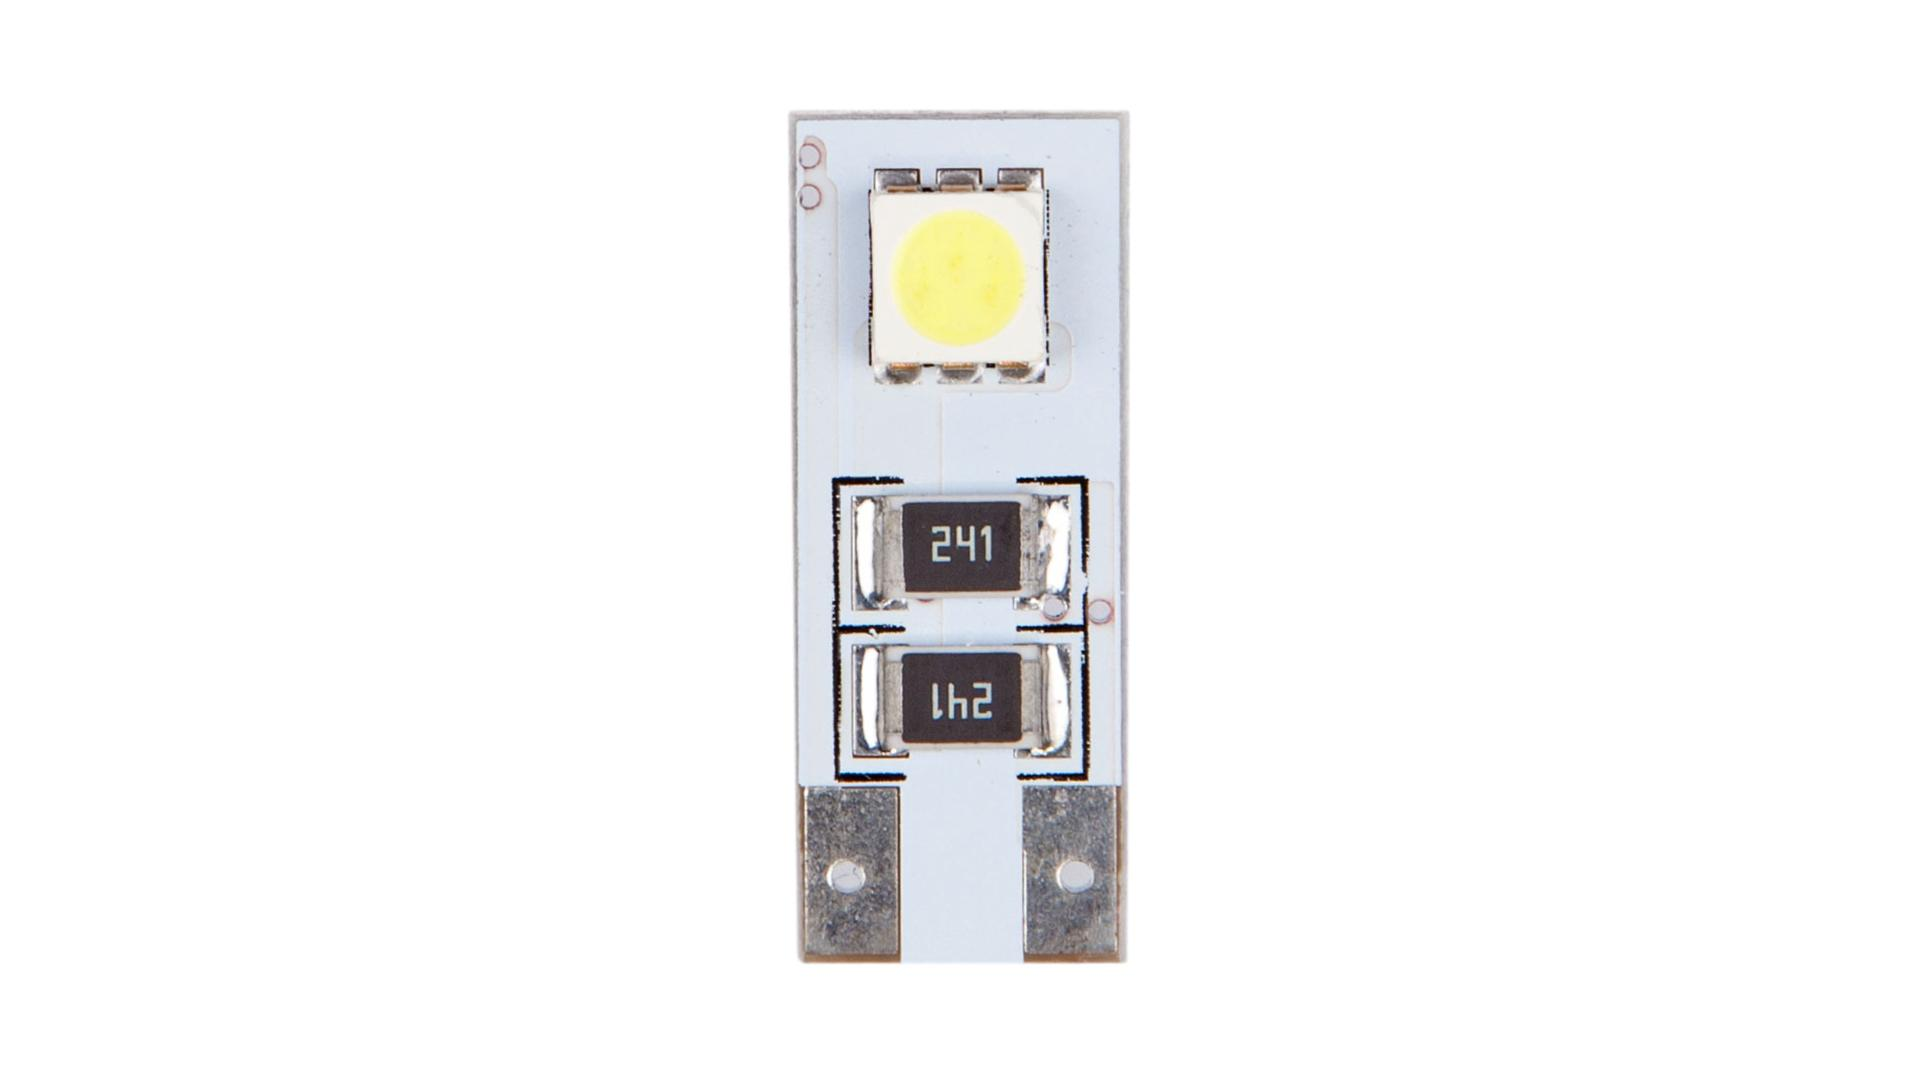 4CARS LED žárovka 2LED 12V CANBUS 5050SMD T10